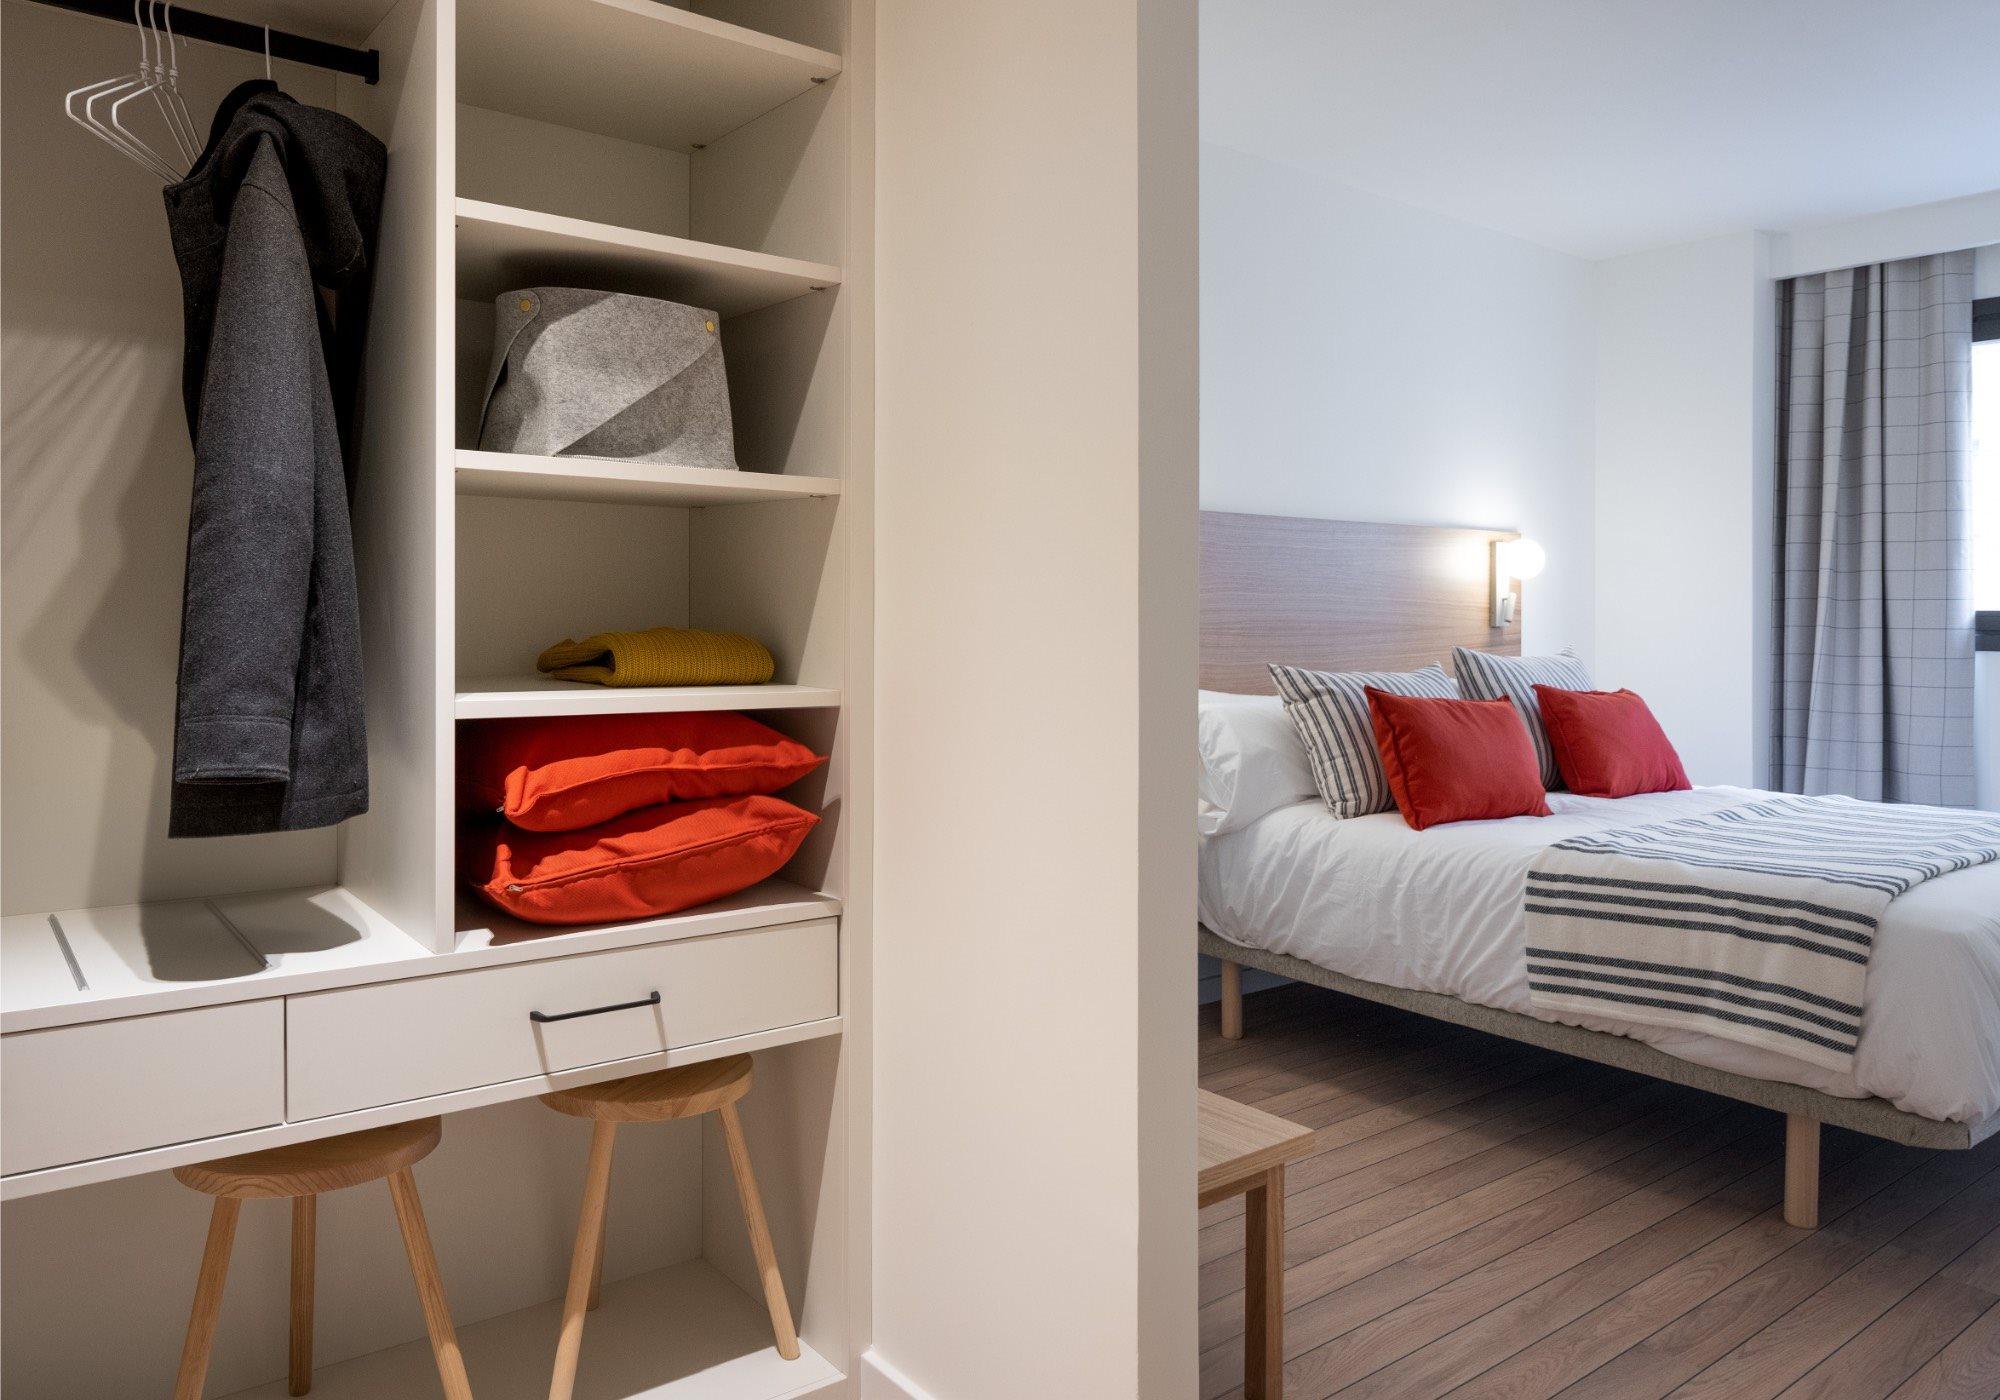 Two bedroom apartment in Vitoria city centre